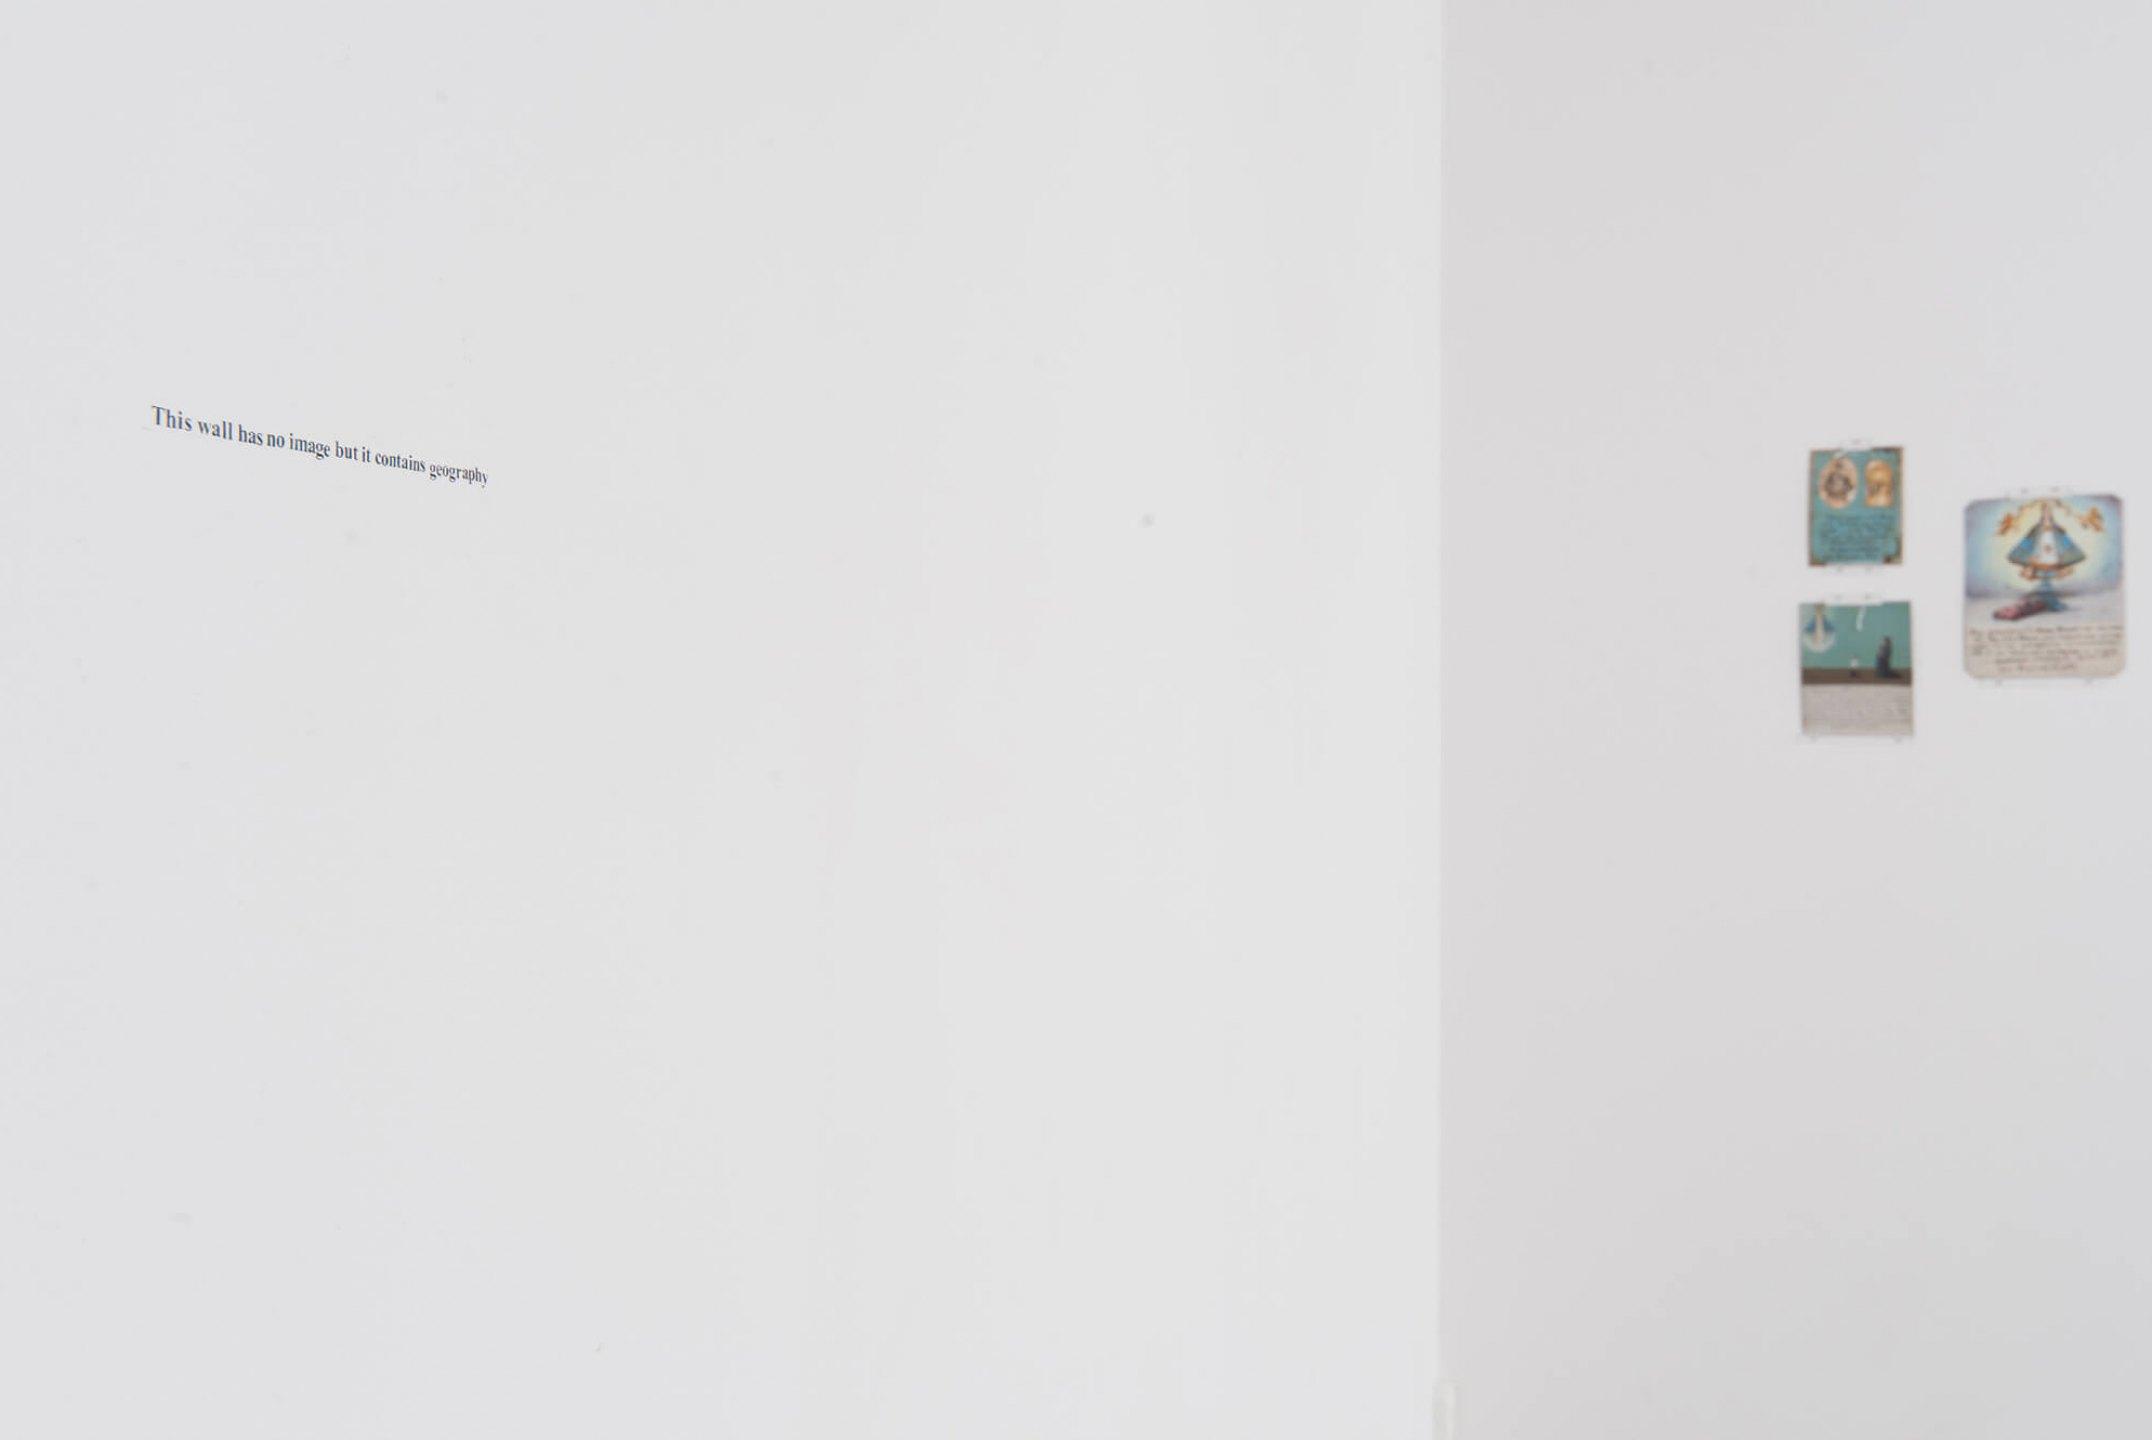 Runo Lagomarsino,<em>This thing called the state</em>, Oslo Kunstforening, Oslo,2013 - Mendes Wood DM